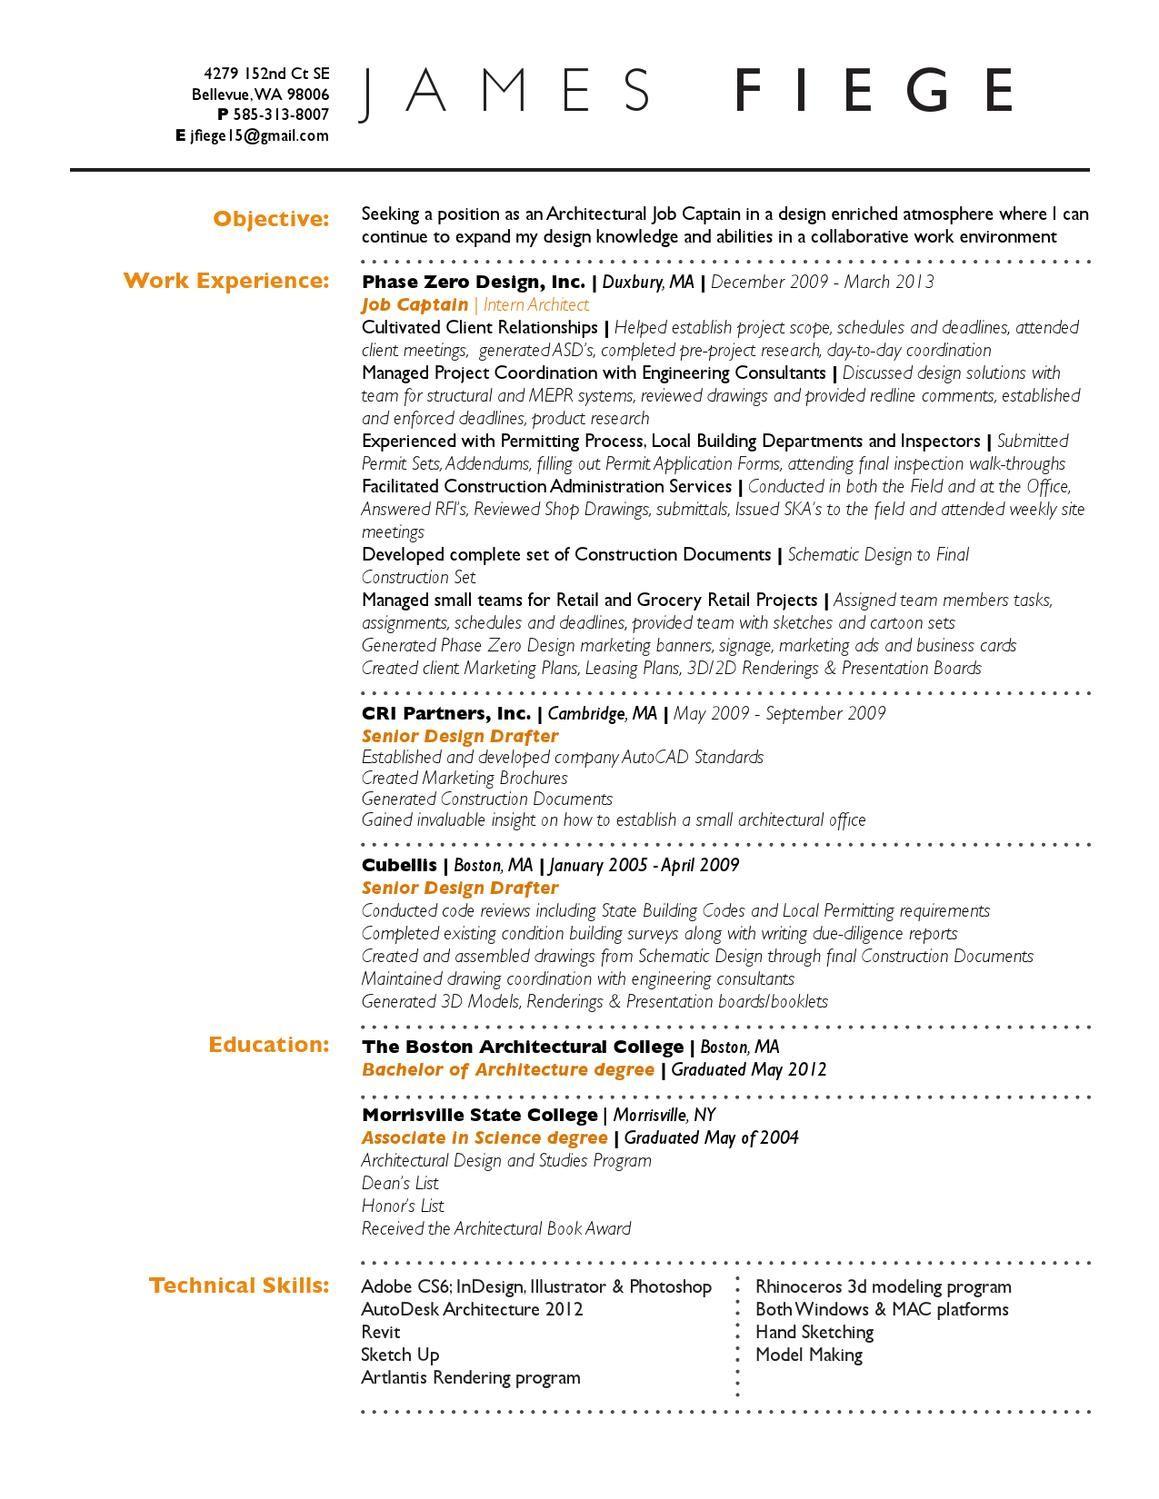 A1 Jim Fiege Resume Resume Self Promo Resume Examples